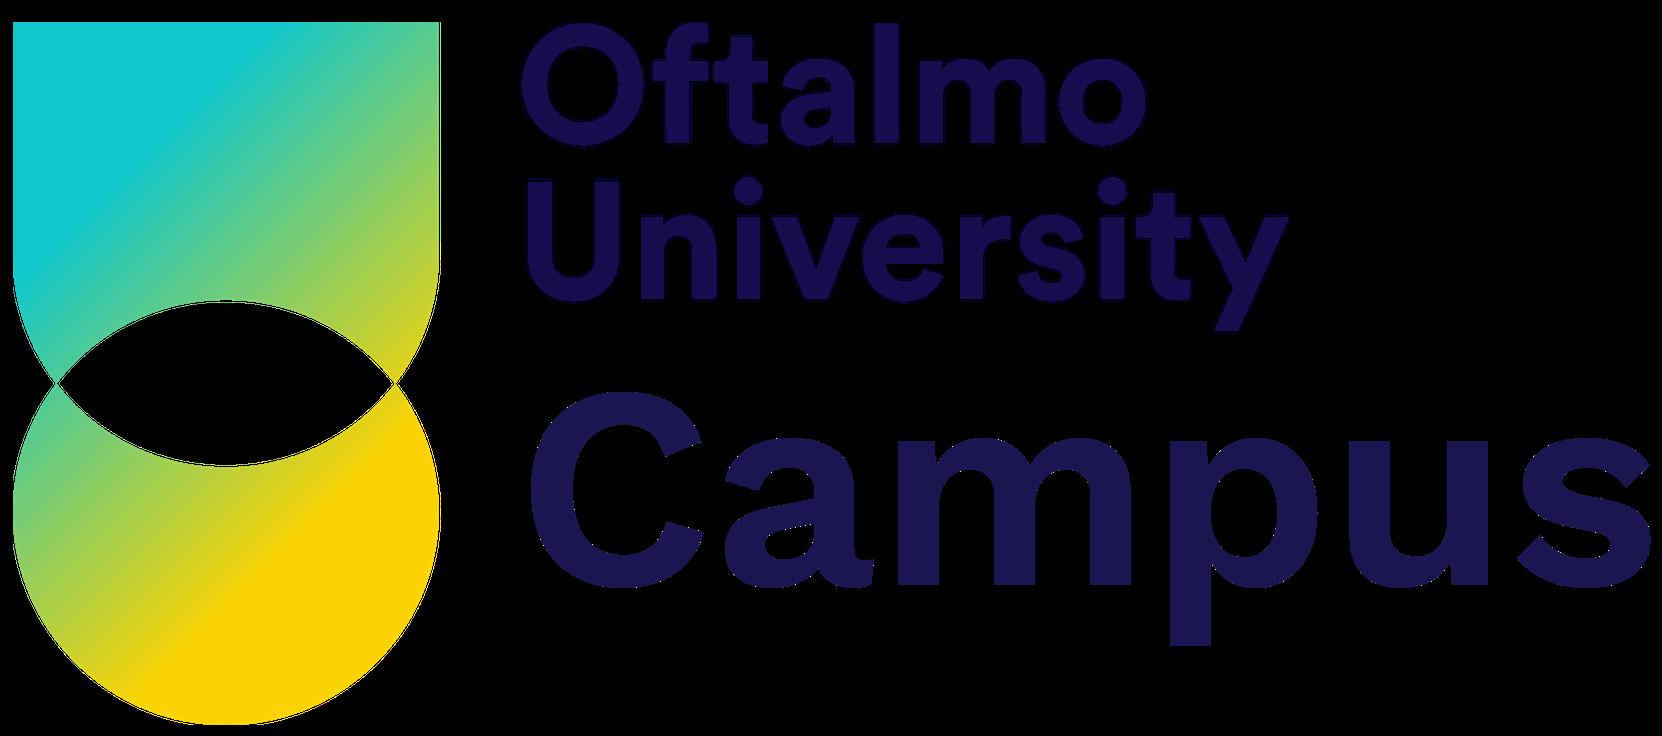 OftalmoUniversity Campus